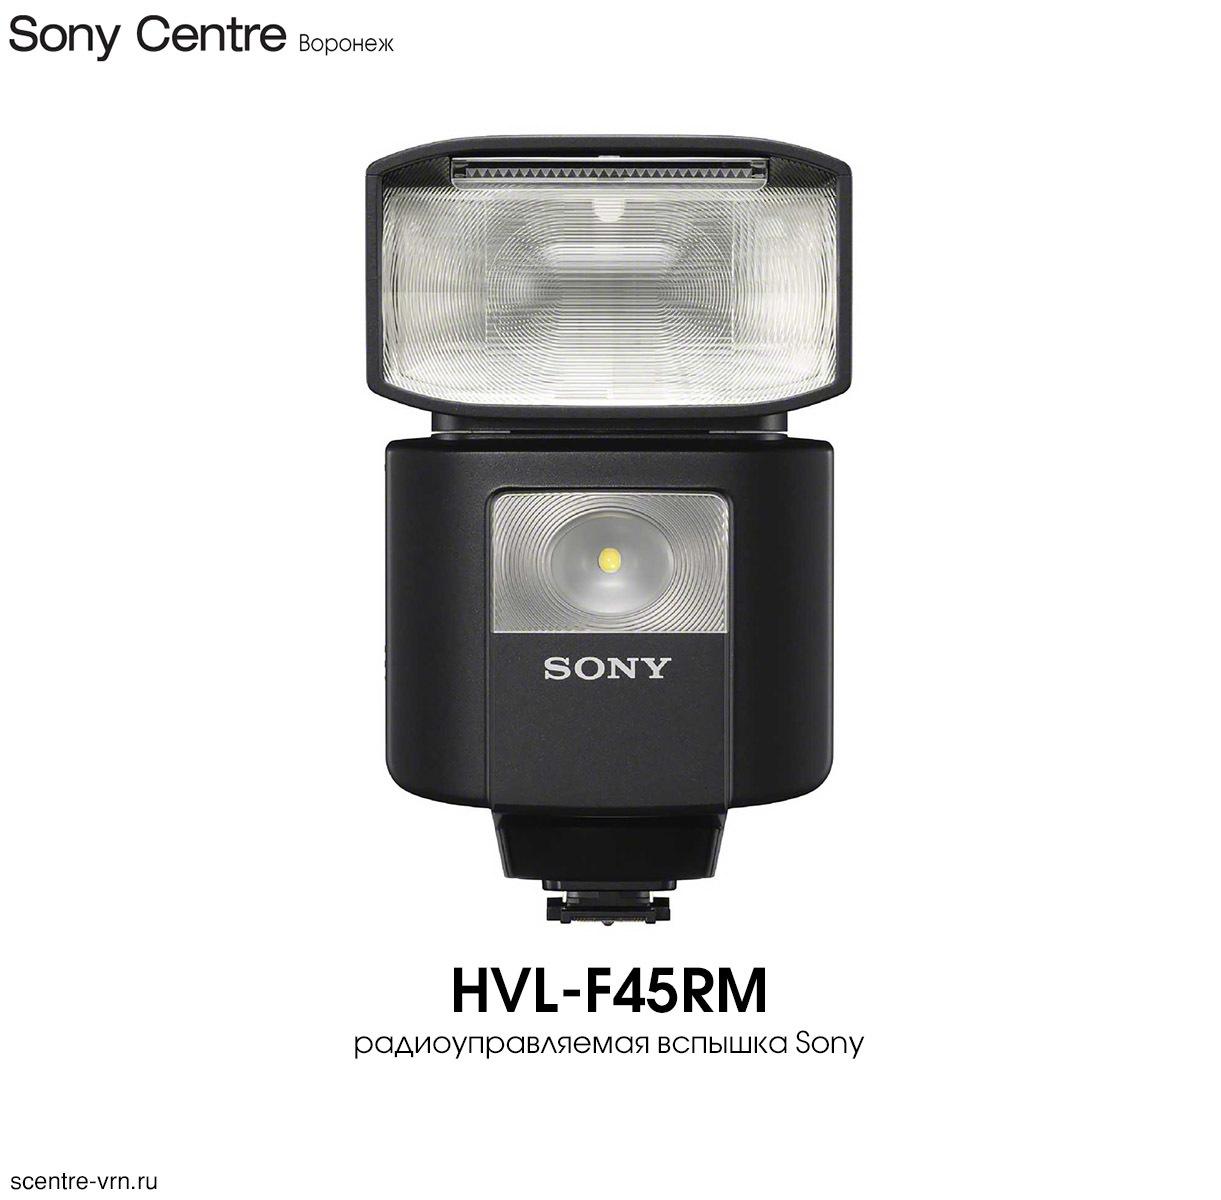 Sony HVL-F45RM купить в Sony Centre Воронеж